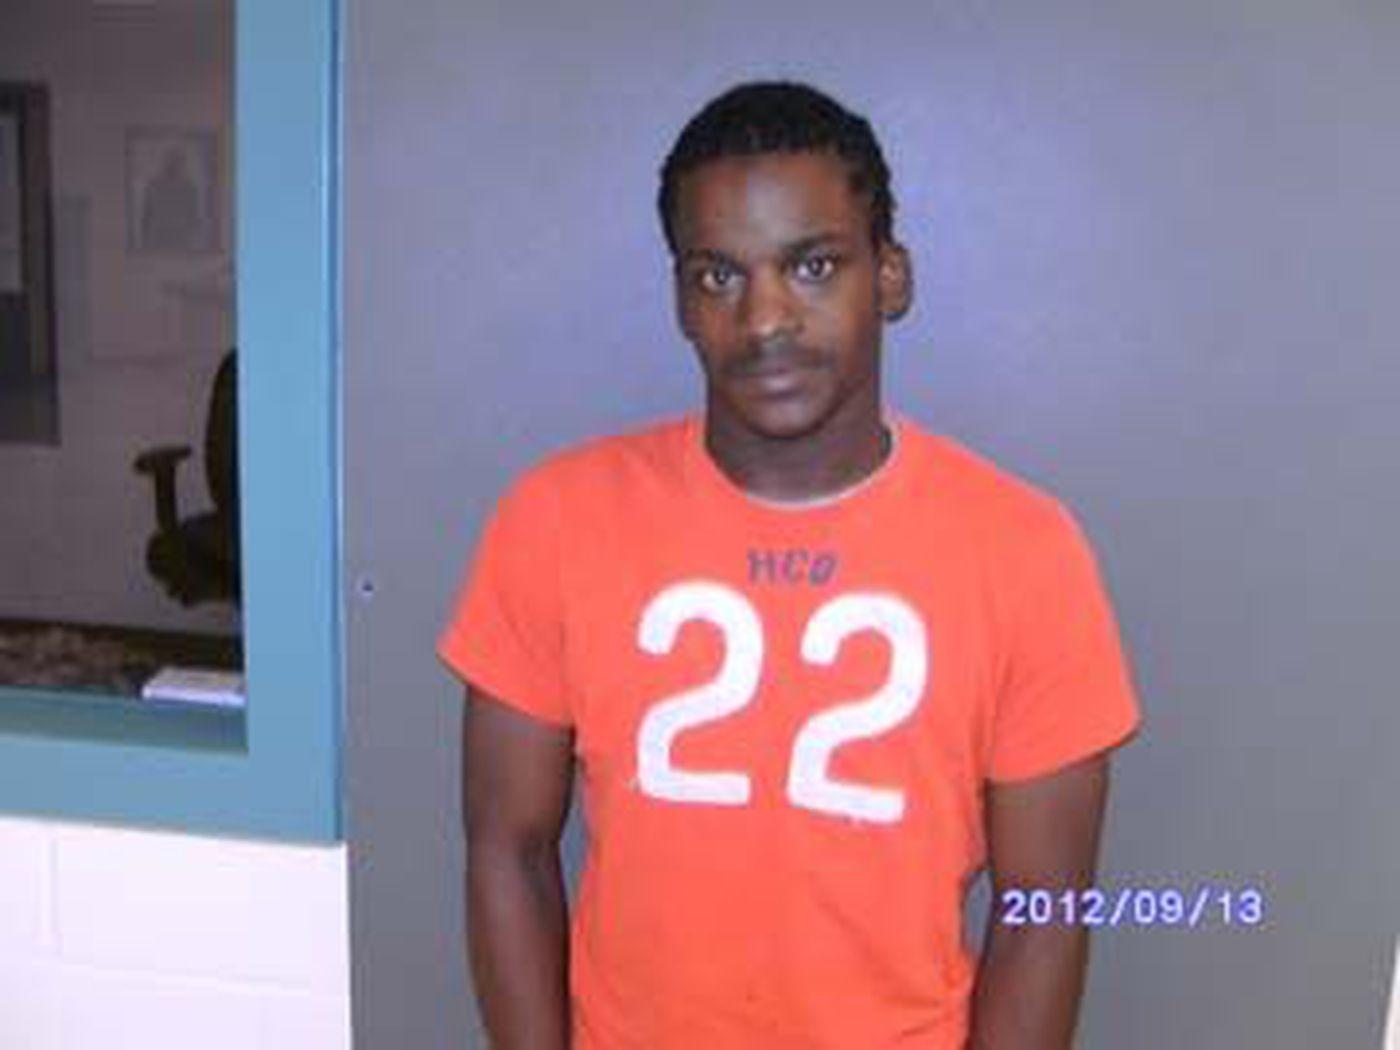 Houston County Jail